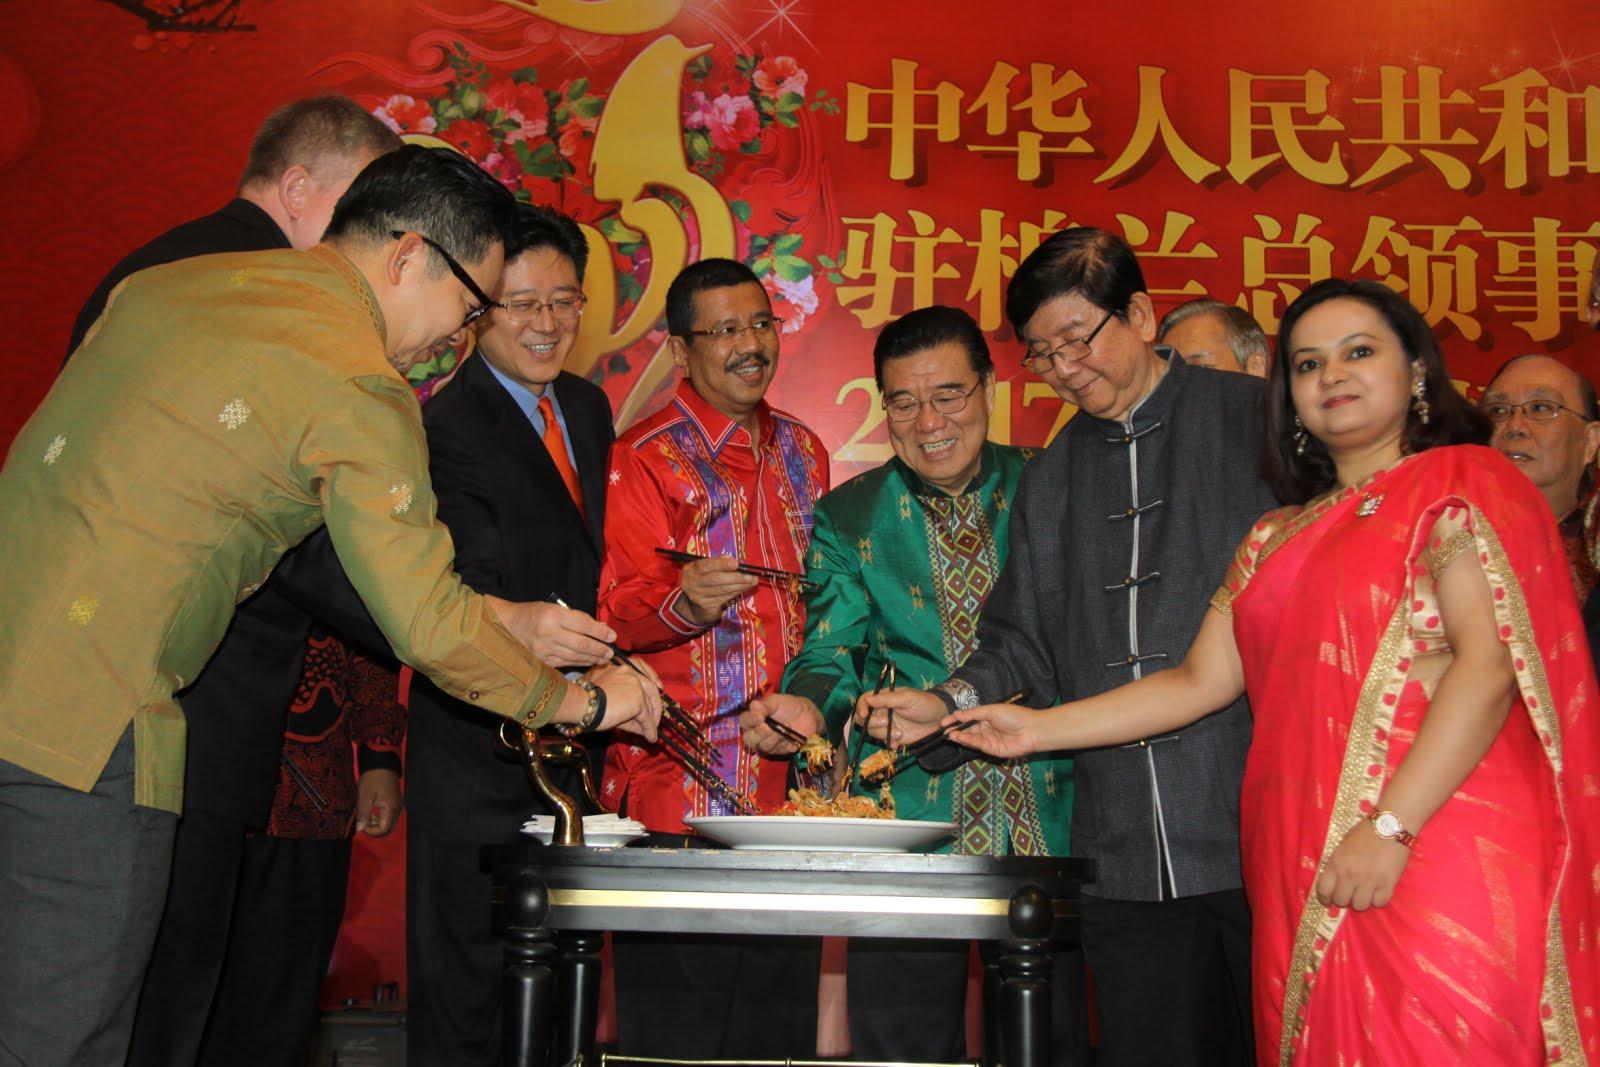 Gong Xi Fa Cai, Gubsu : Tahun Baru Imlek Miliki Multi Makna bagi Umat Khonghucu